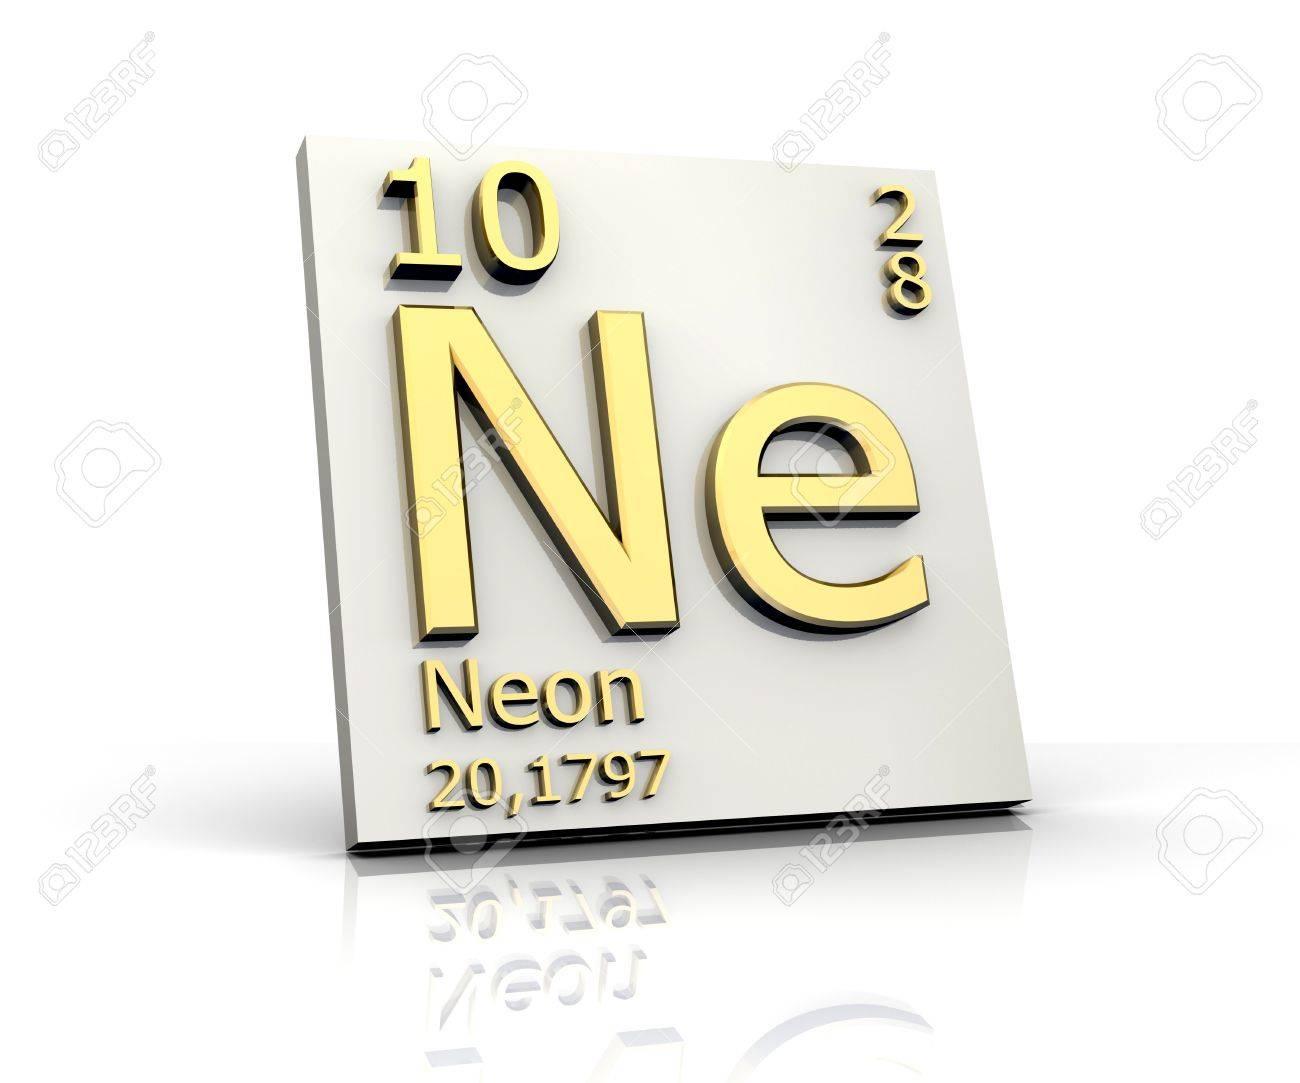 Ni on periodic table gallery periodic table images neon in periodic table images periodic table images neon form periodic table of elements stock photo gamestrikefo Gallery